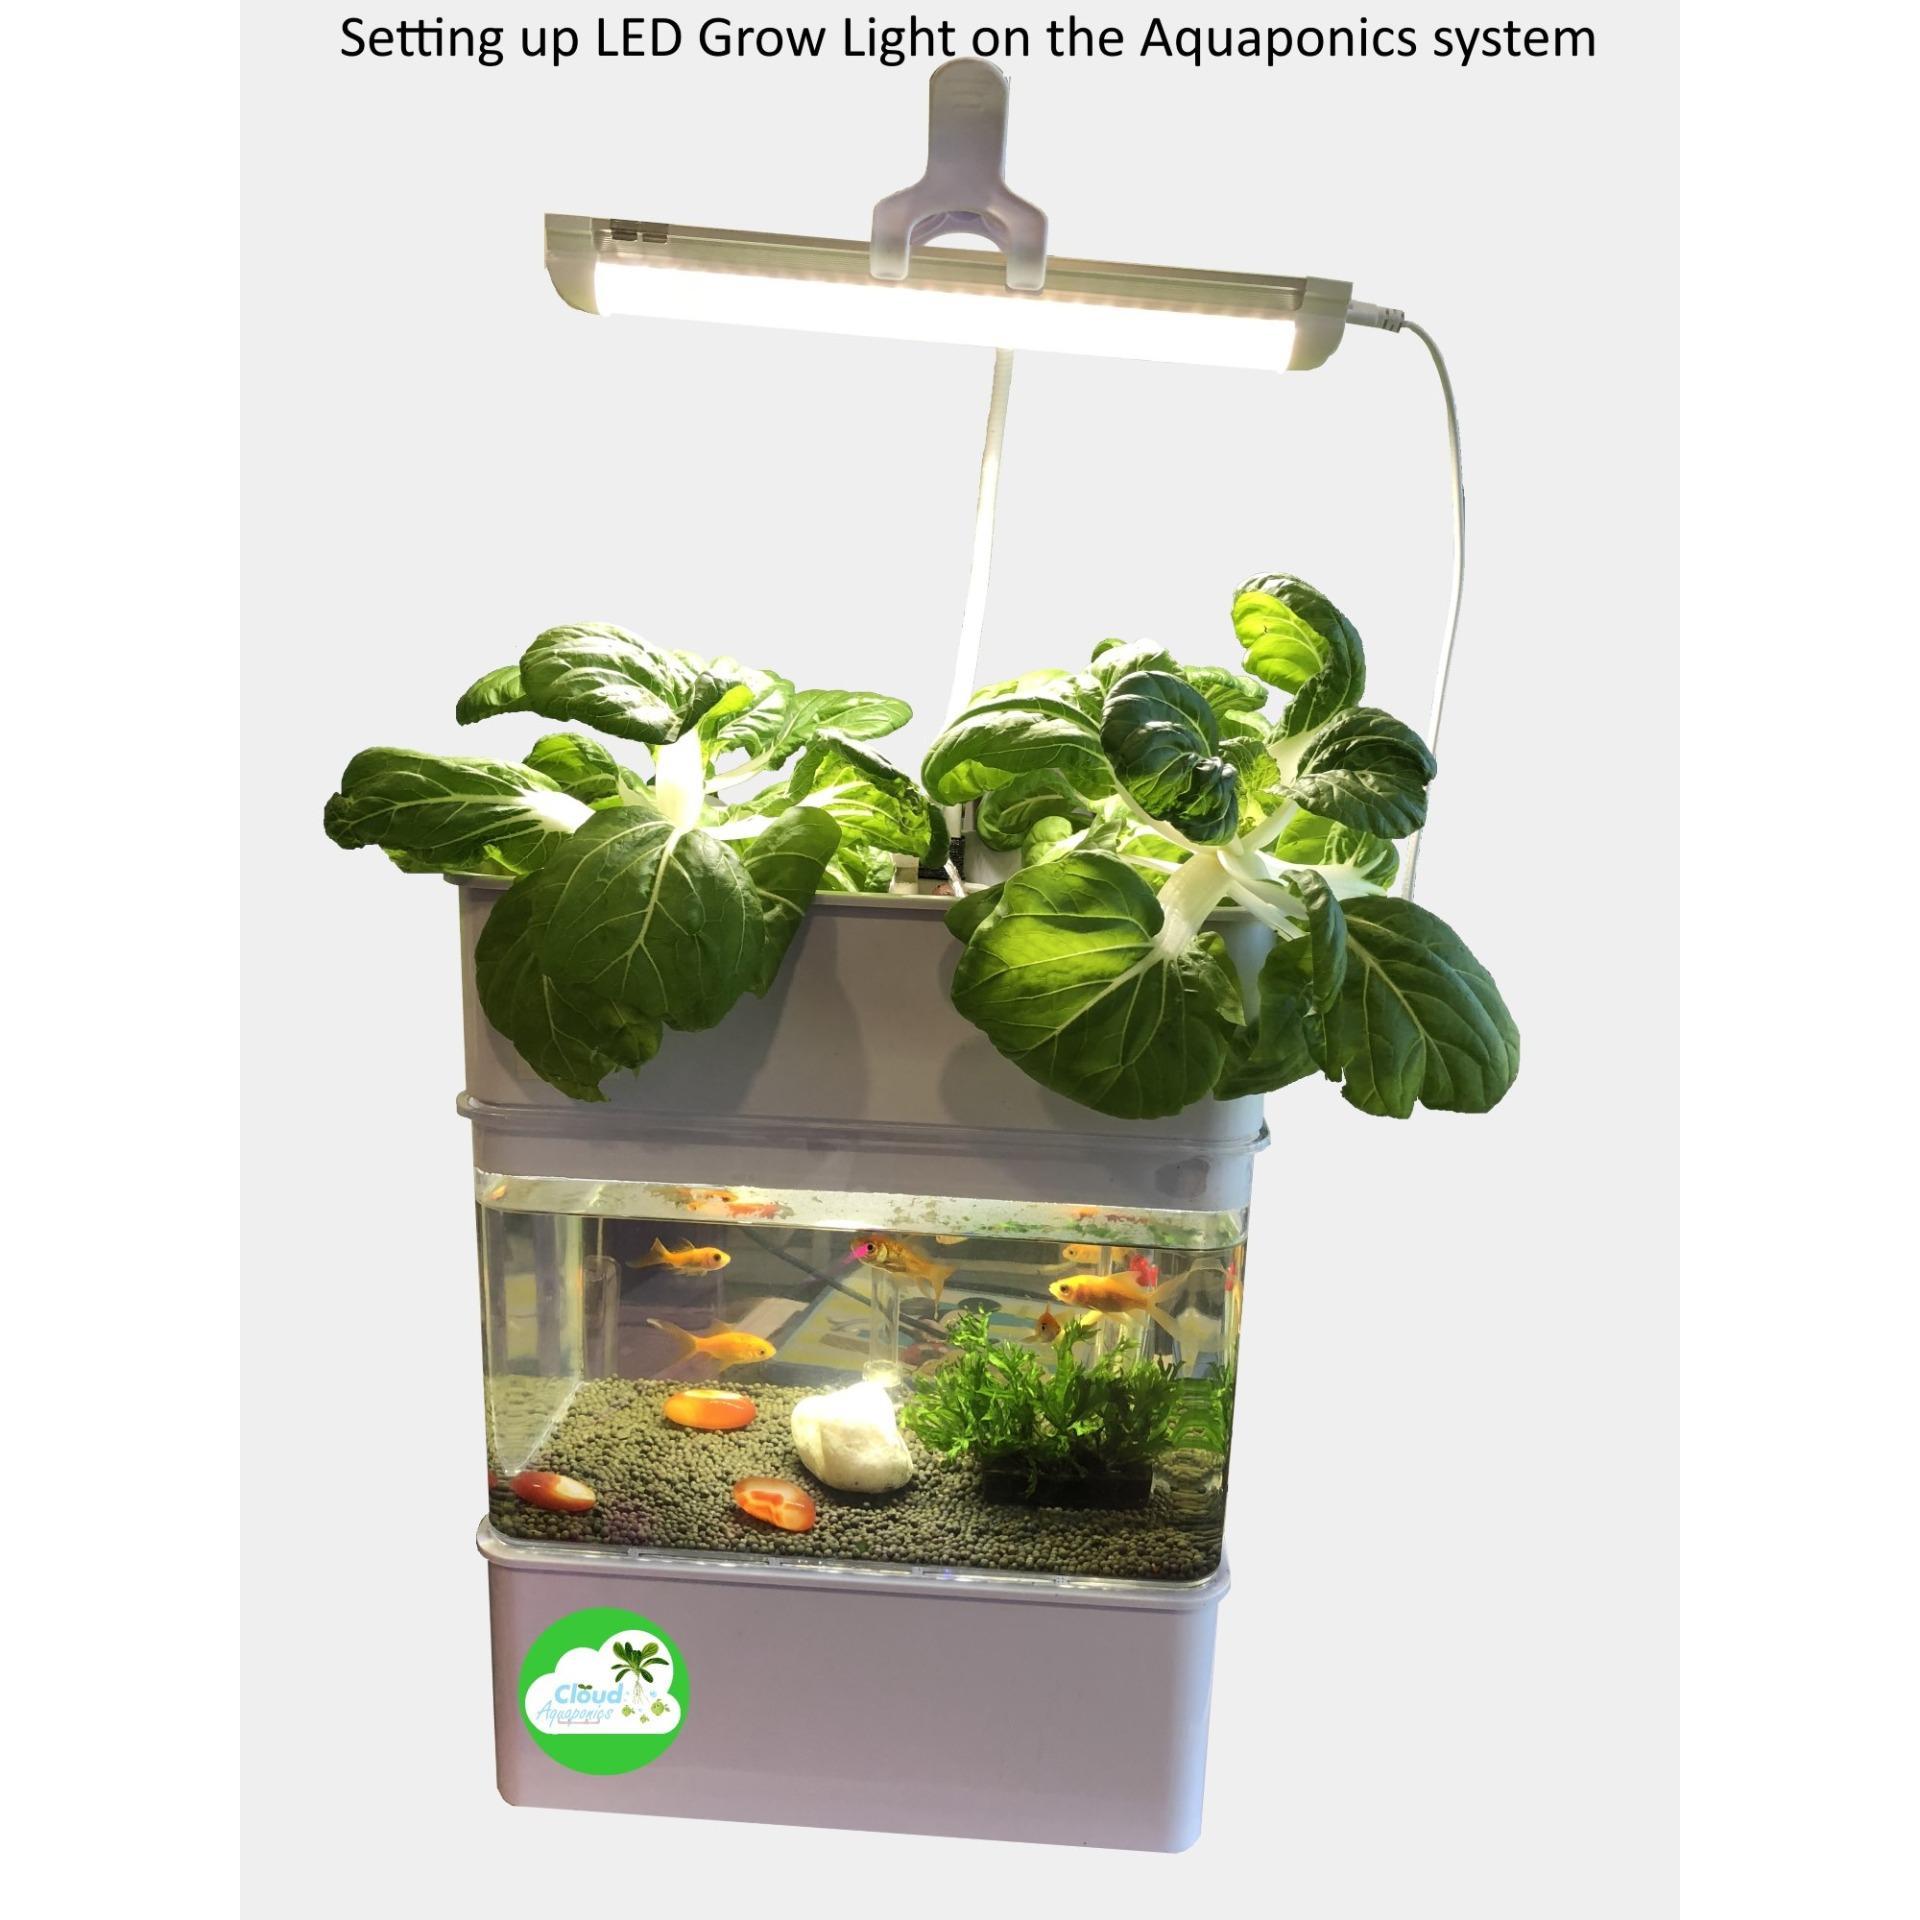 Miniponics- Aquaponics system Home Aquarium Grow your own herb Hydroponics